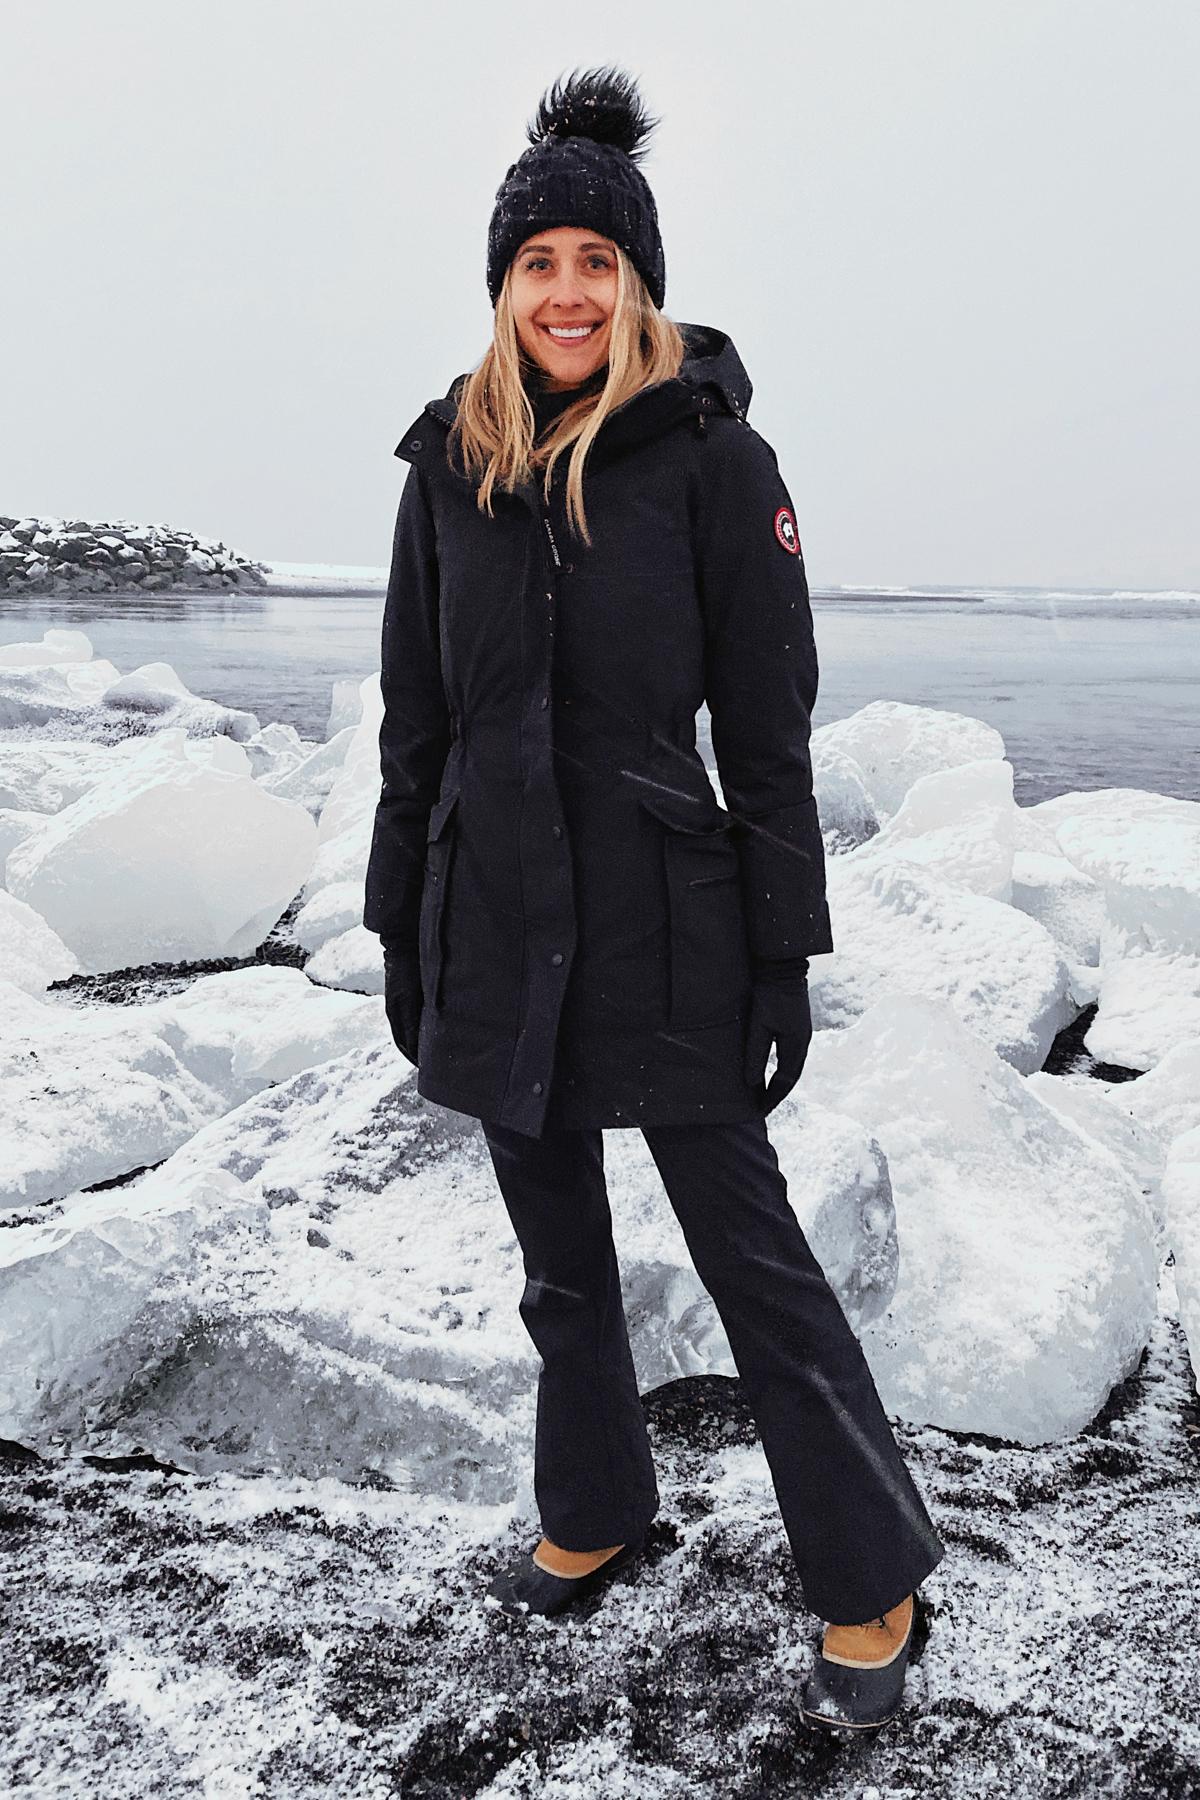 Fashion Jackson Wearing Canada Goose Black Jacket Black Winter Pants Sorel Winter Boots Black Beanie Diamond Beach Iceland Itinerary Travel Guide